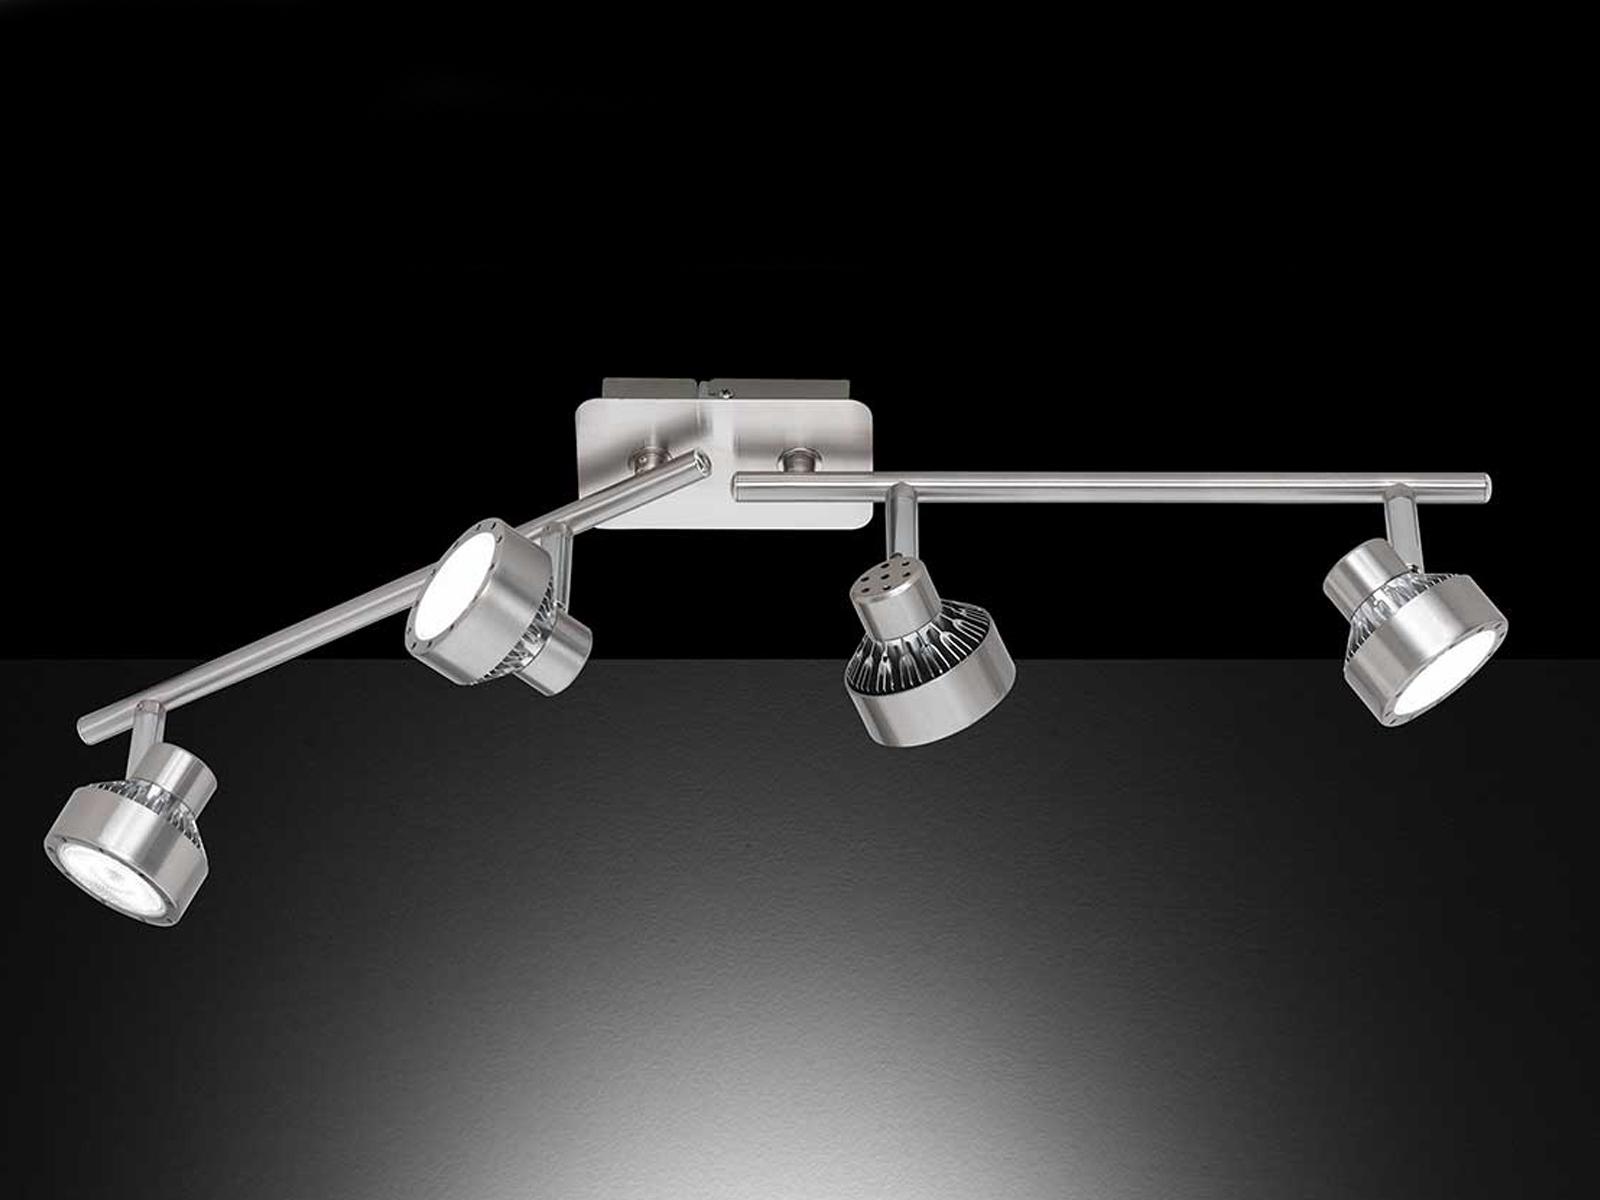 6-flammige LED Deckenlampe LOCAL dimmbar Deckenleuchte Spotleiste Deckenbalken